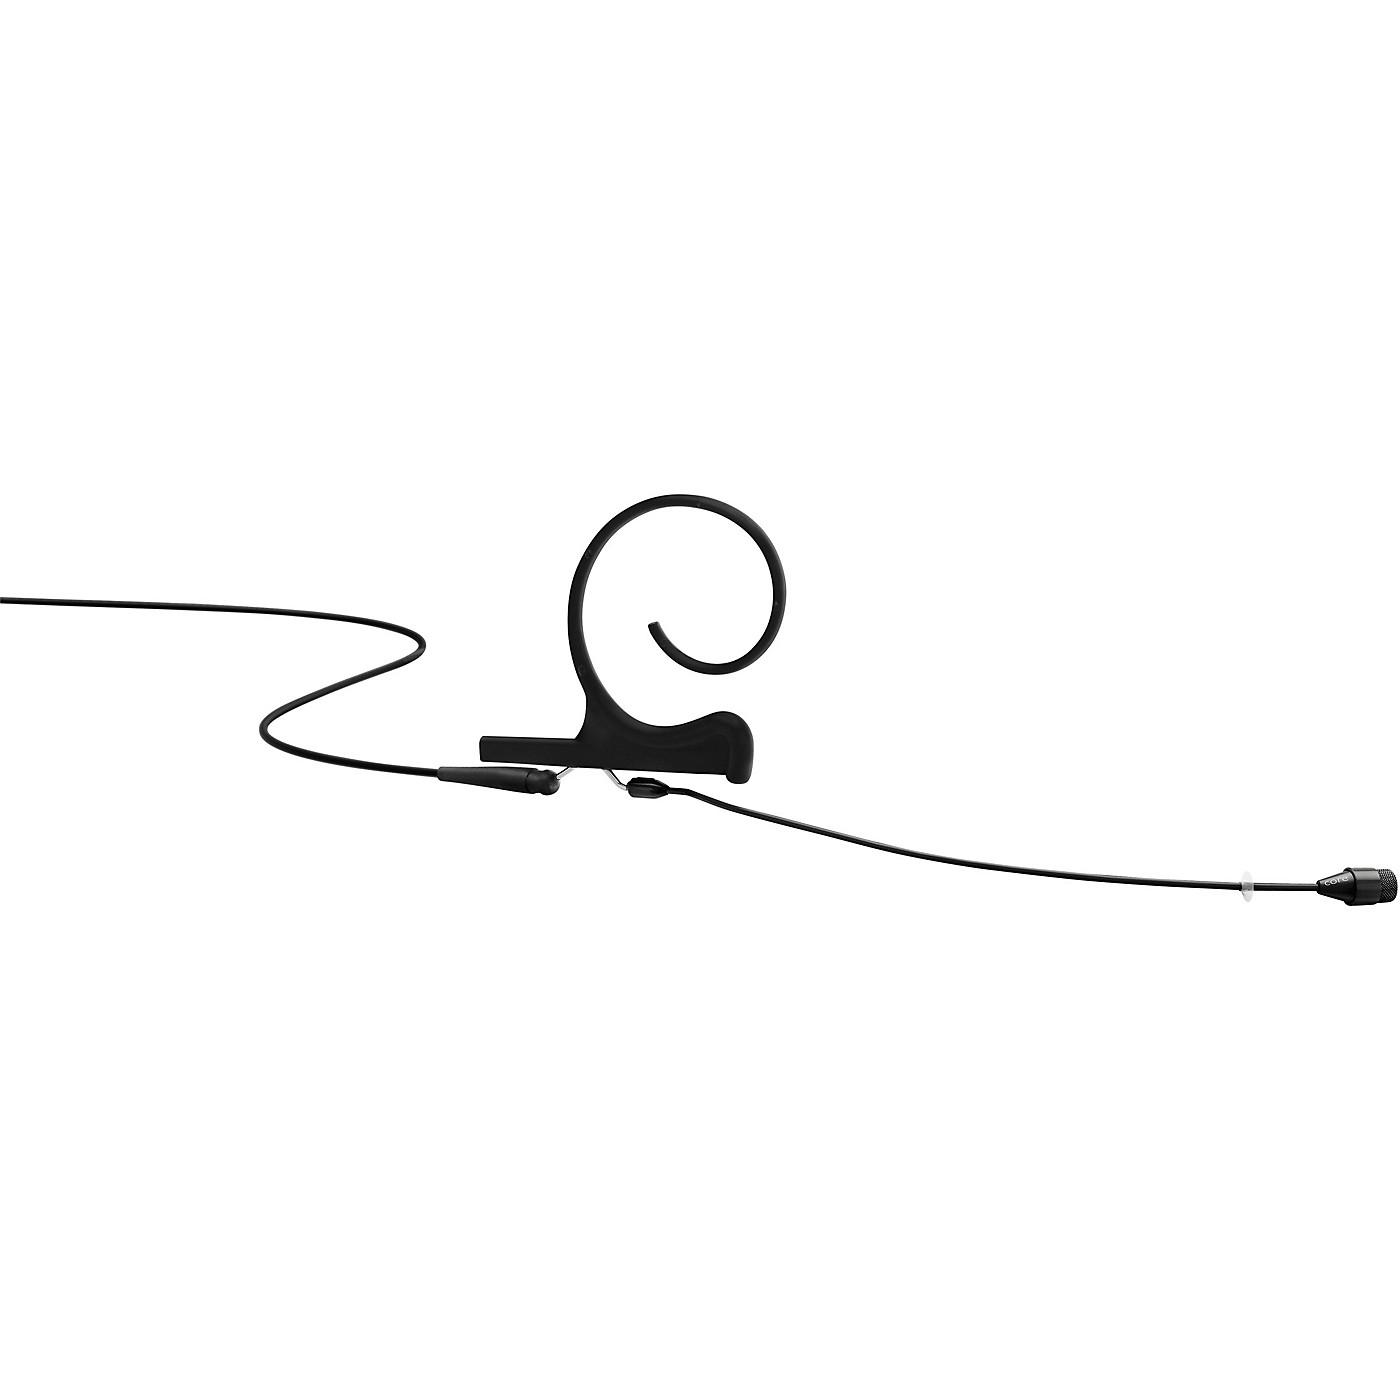 DPA Microphones d:fine Omni 66 capsule , headset mic, Single ear, 90mm boom, Microdot, Black thumbnail